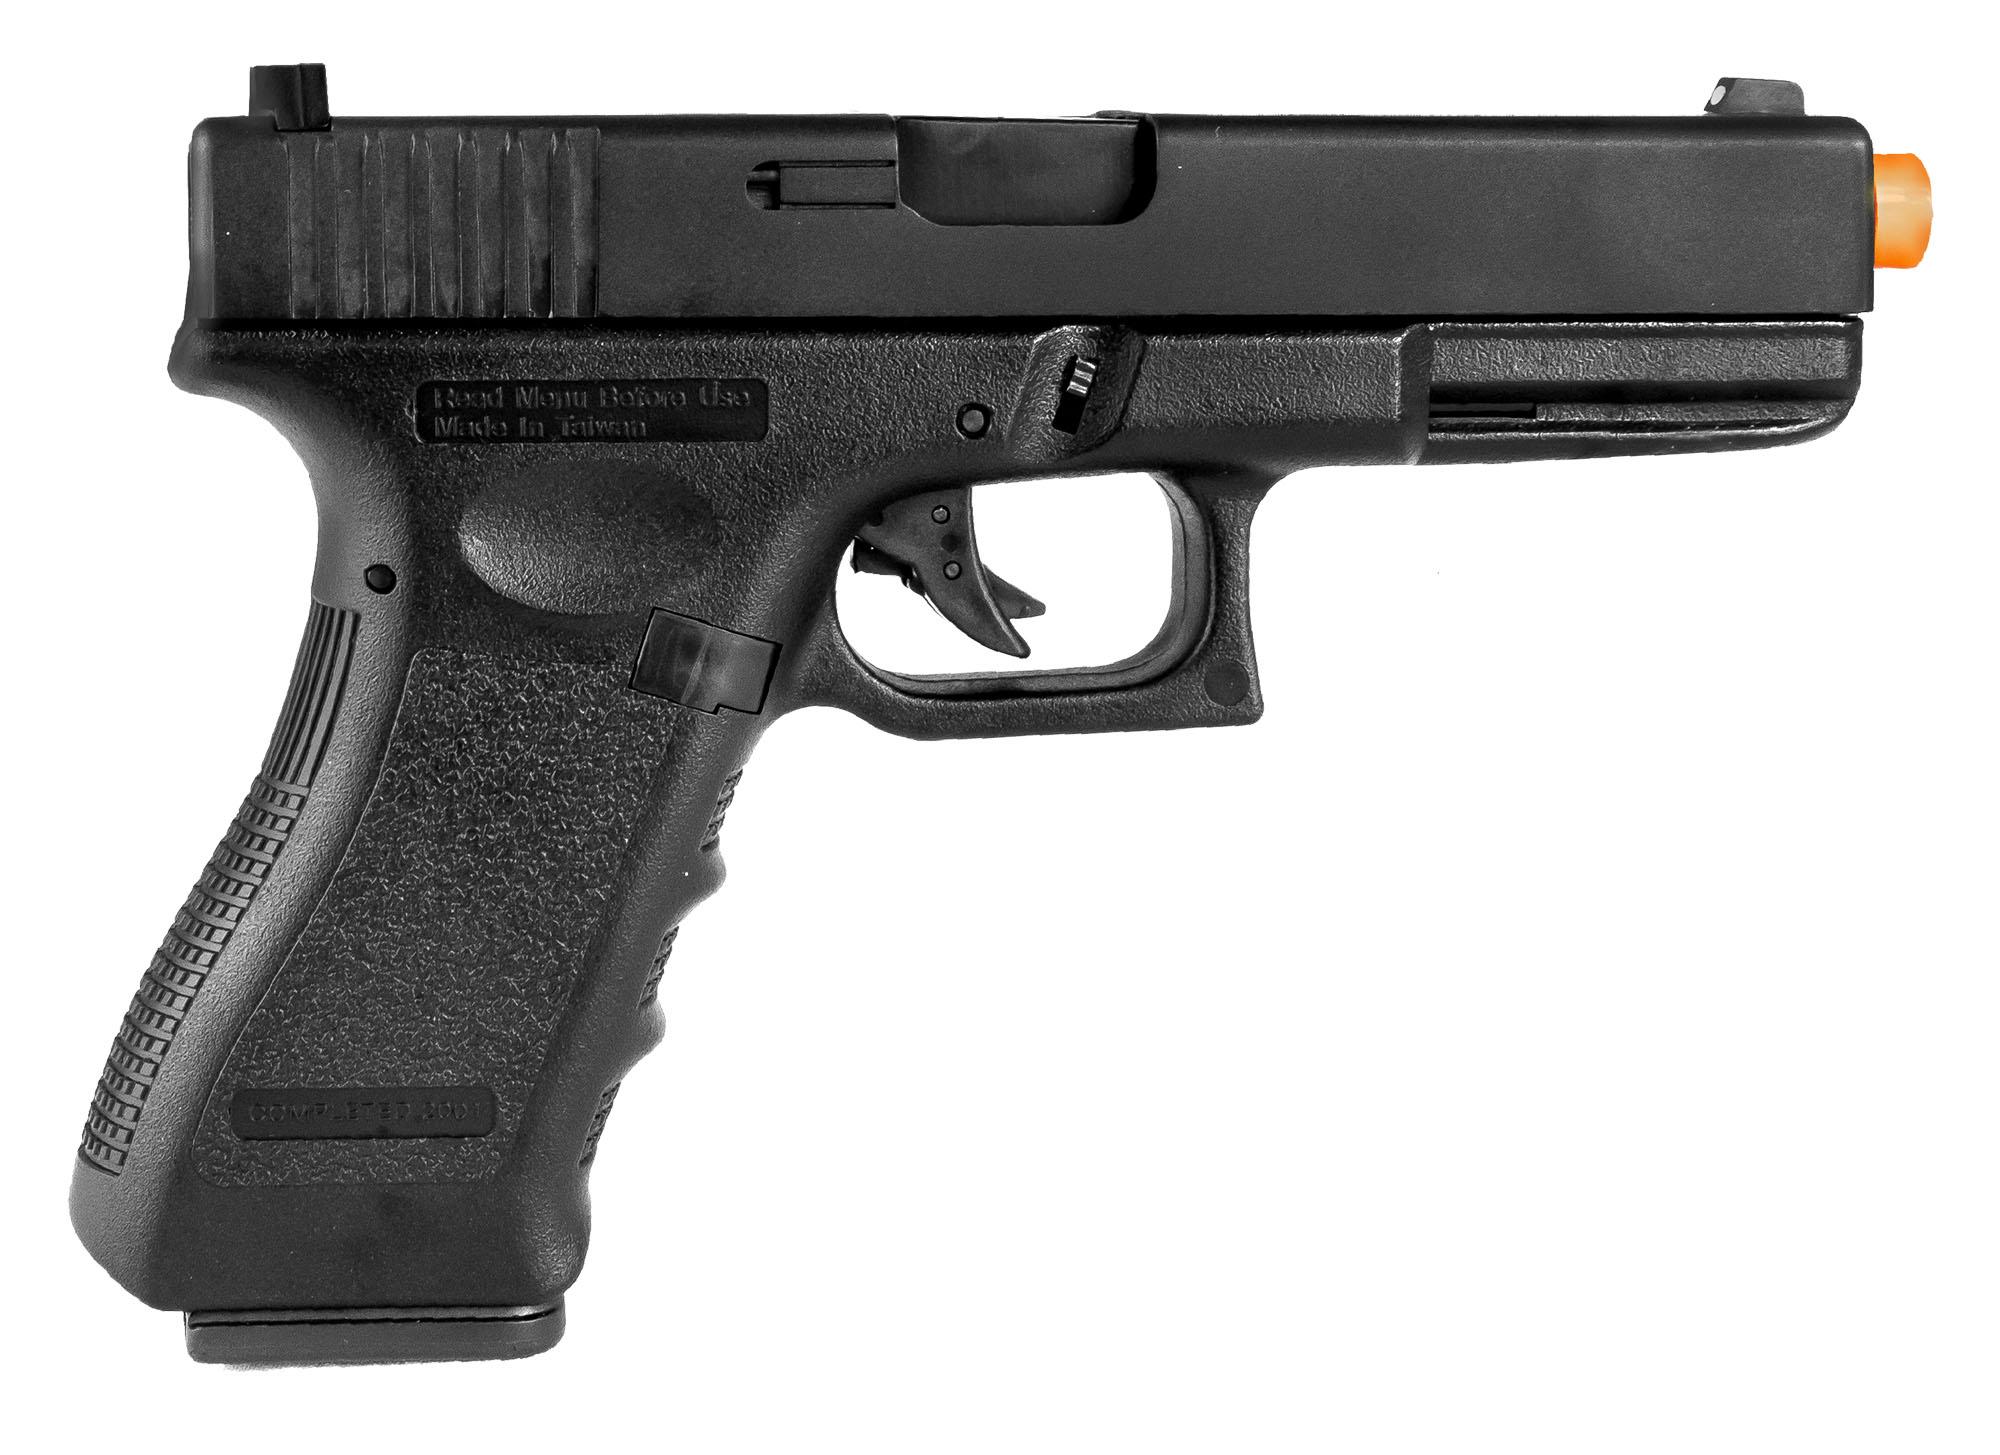 Pistola Airsoft HFC a Gás GBB G18 Blowback com Slide Metal 6mm